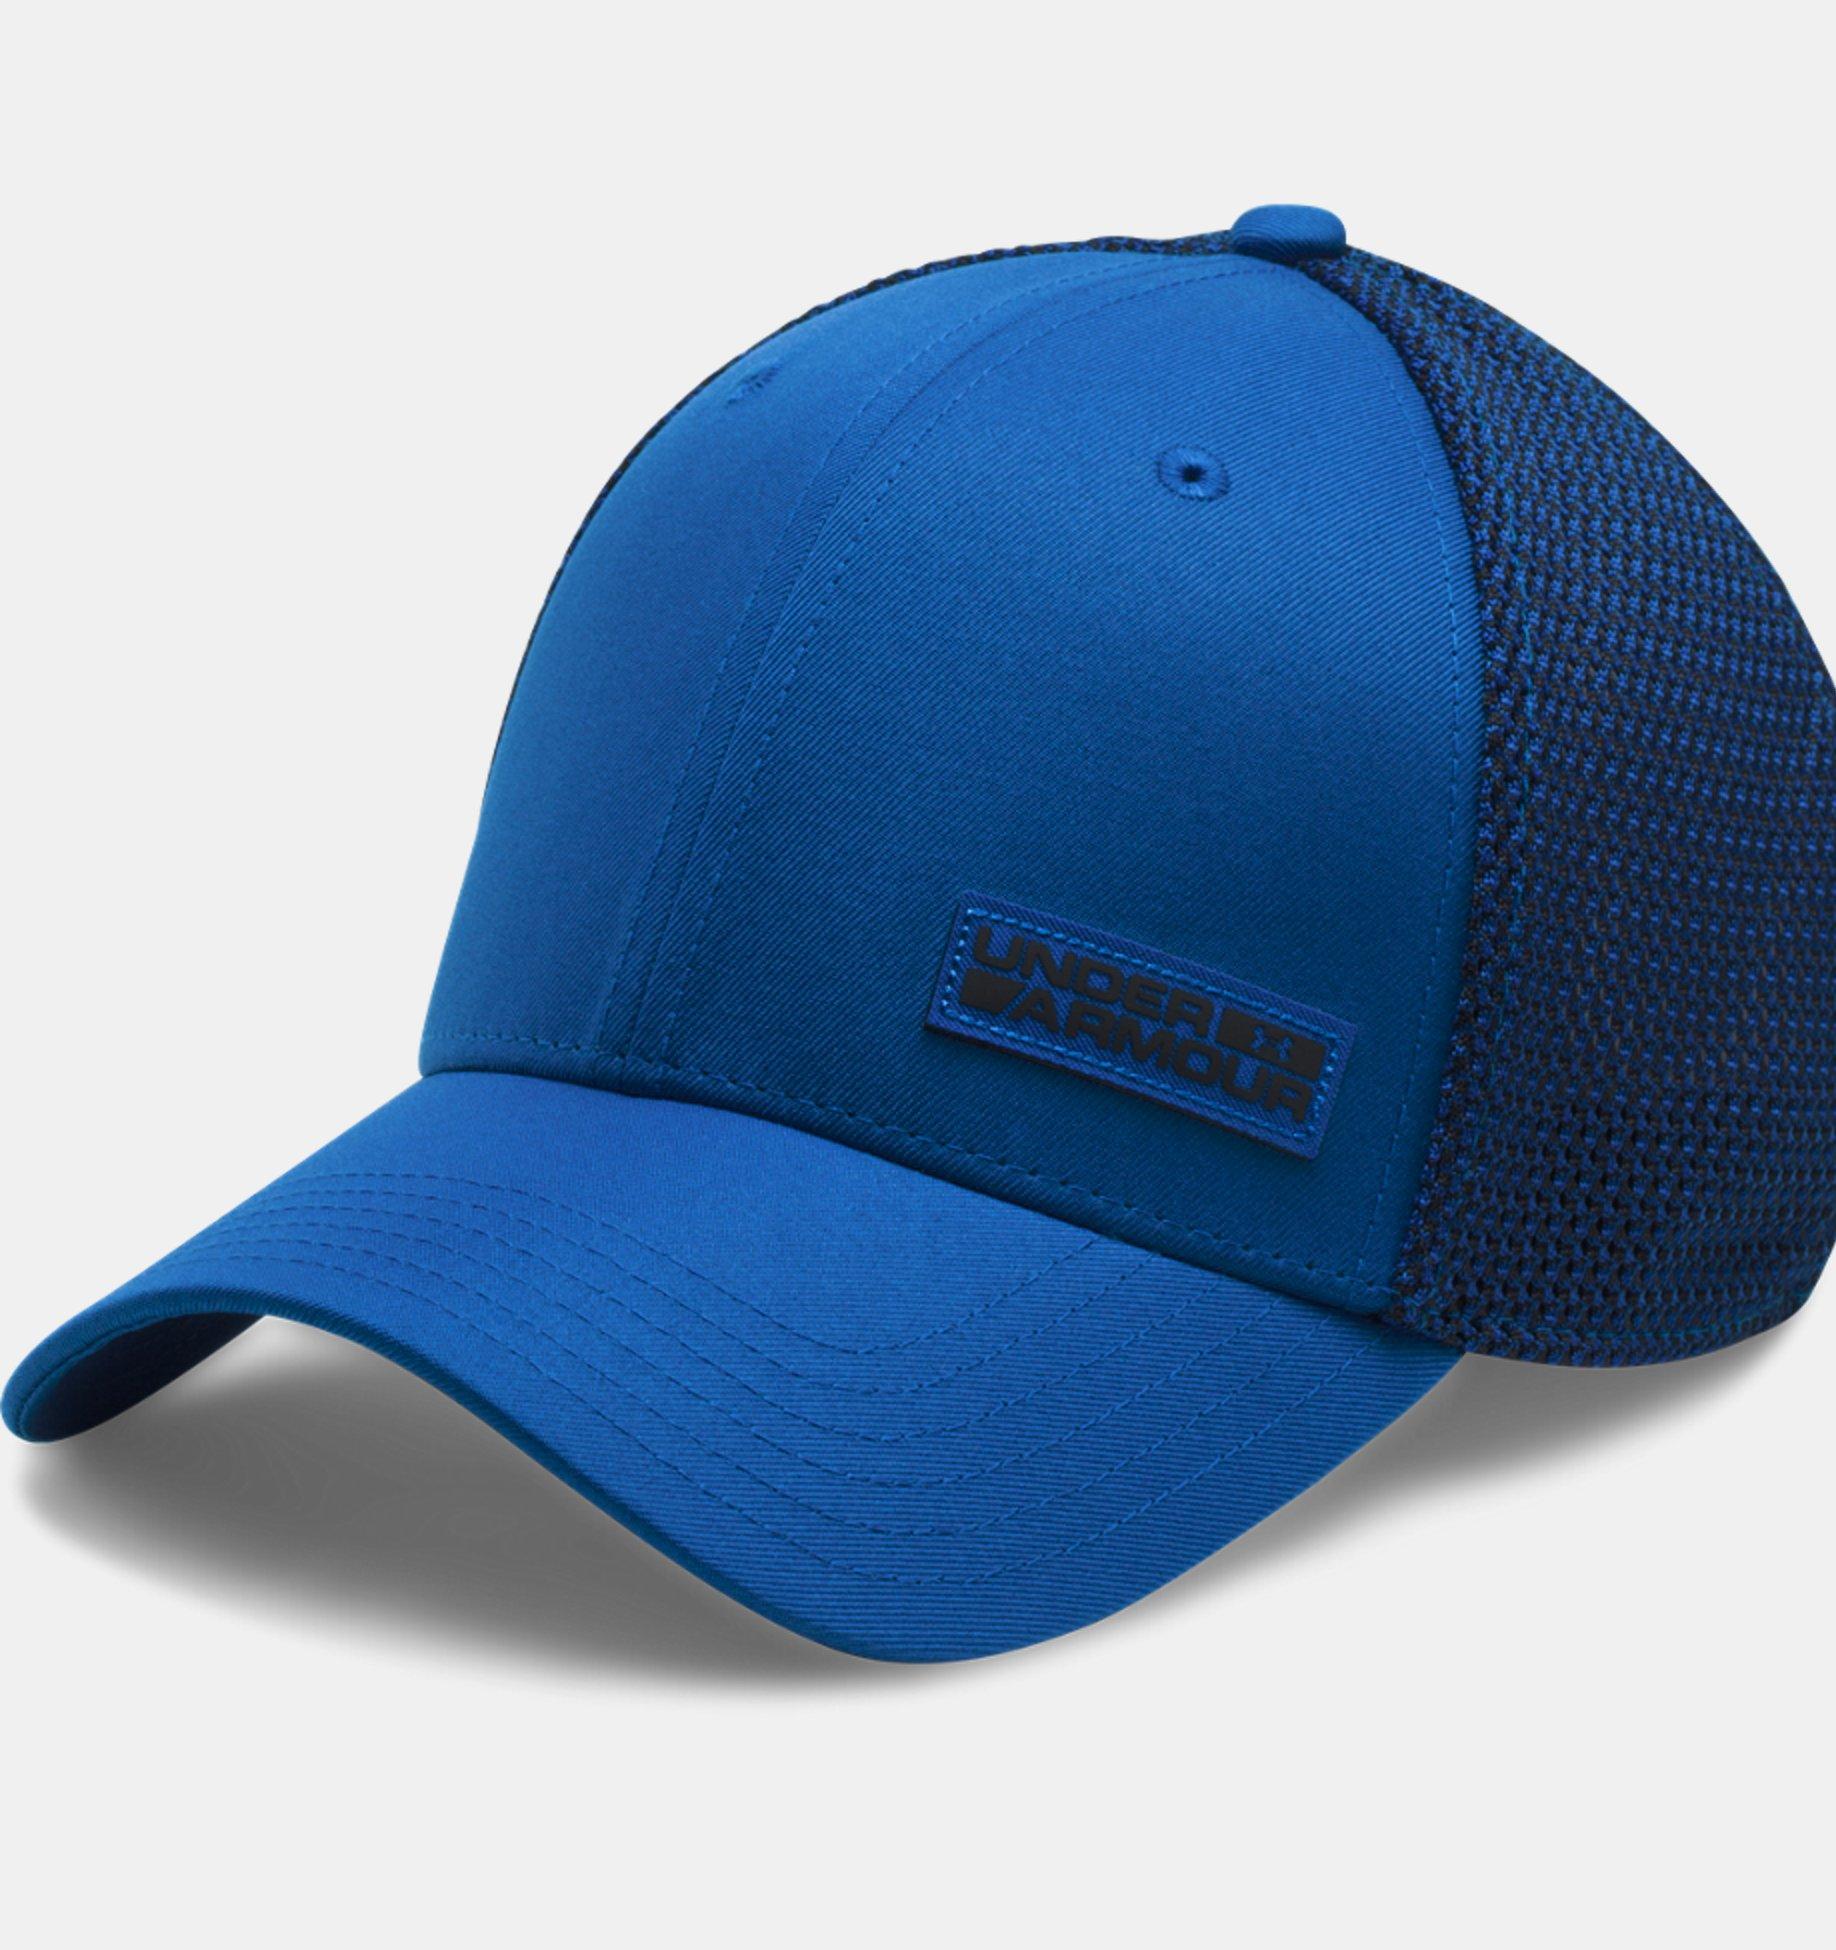 55effe0354d Alternate Views. Men s UA Twist Low Crown Cap ...